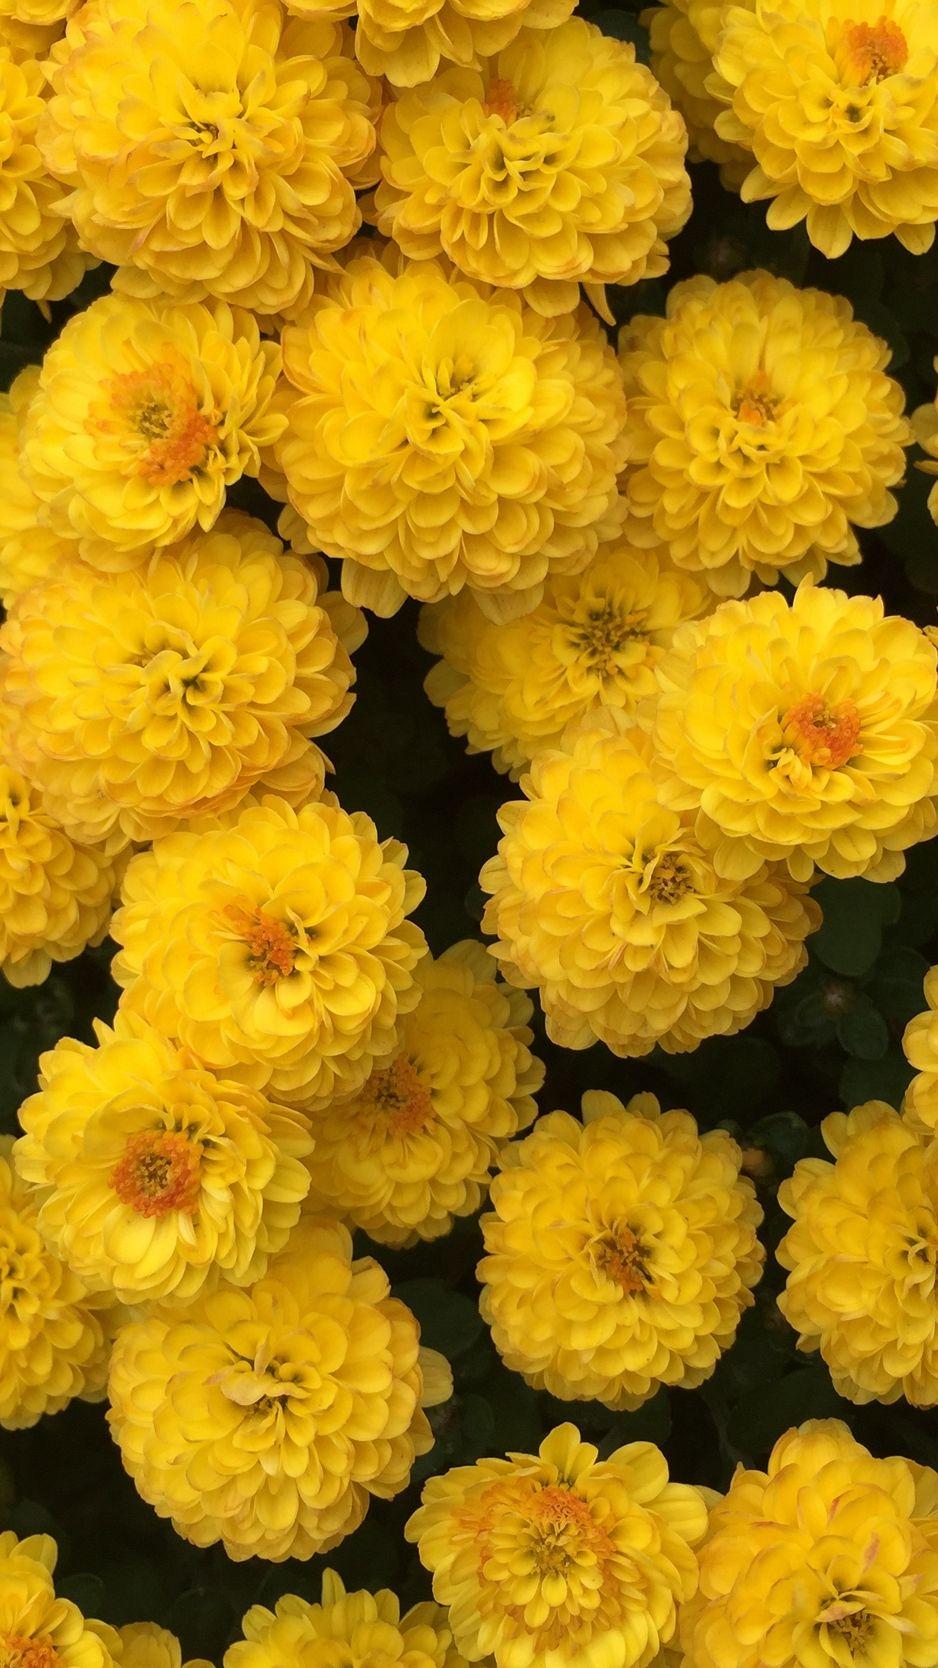 pin by djanik on fotoramki in 2020 flower iphone wallpaper yellow wallpaper tumblr backgrounds flower iphone wallpaper yellow